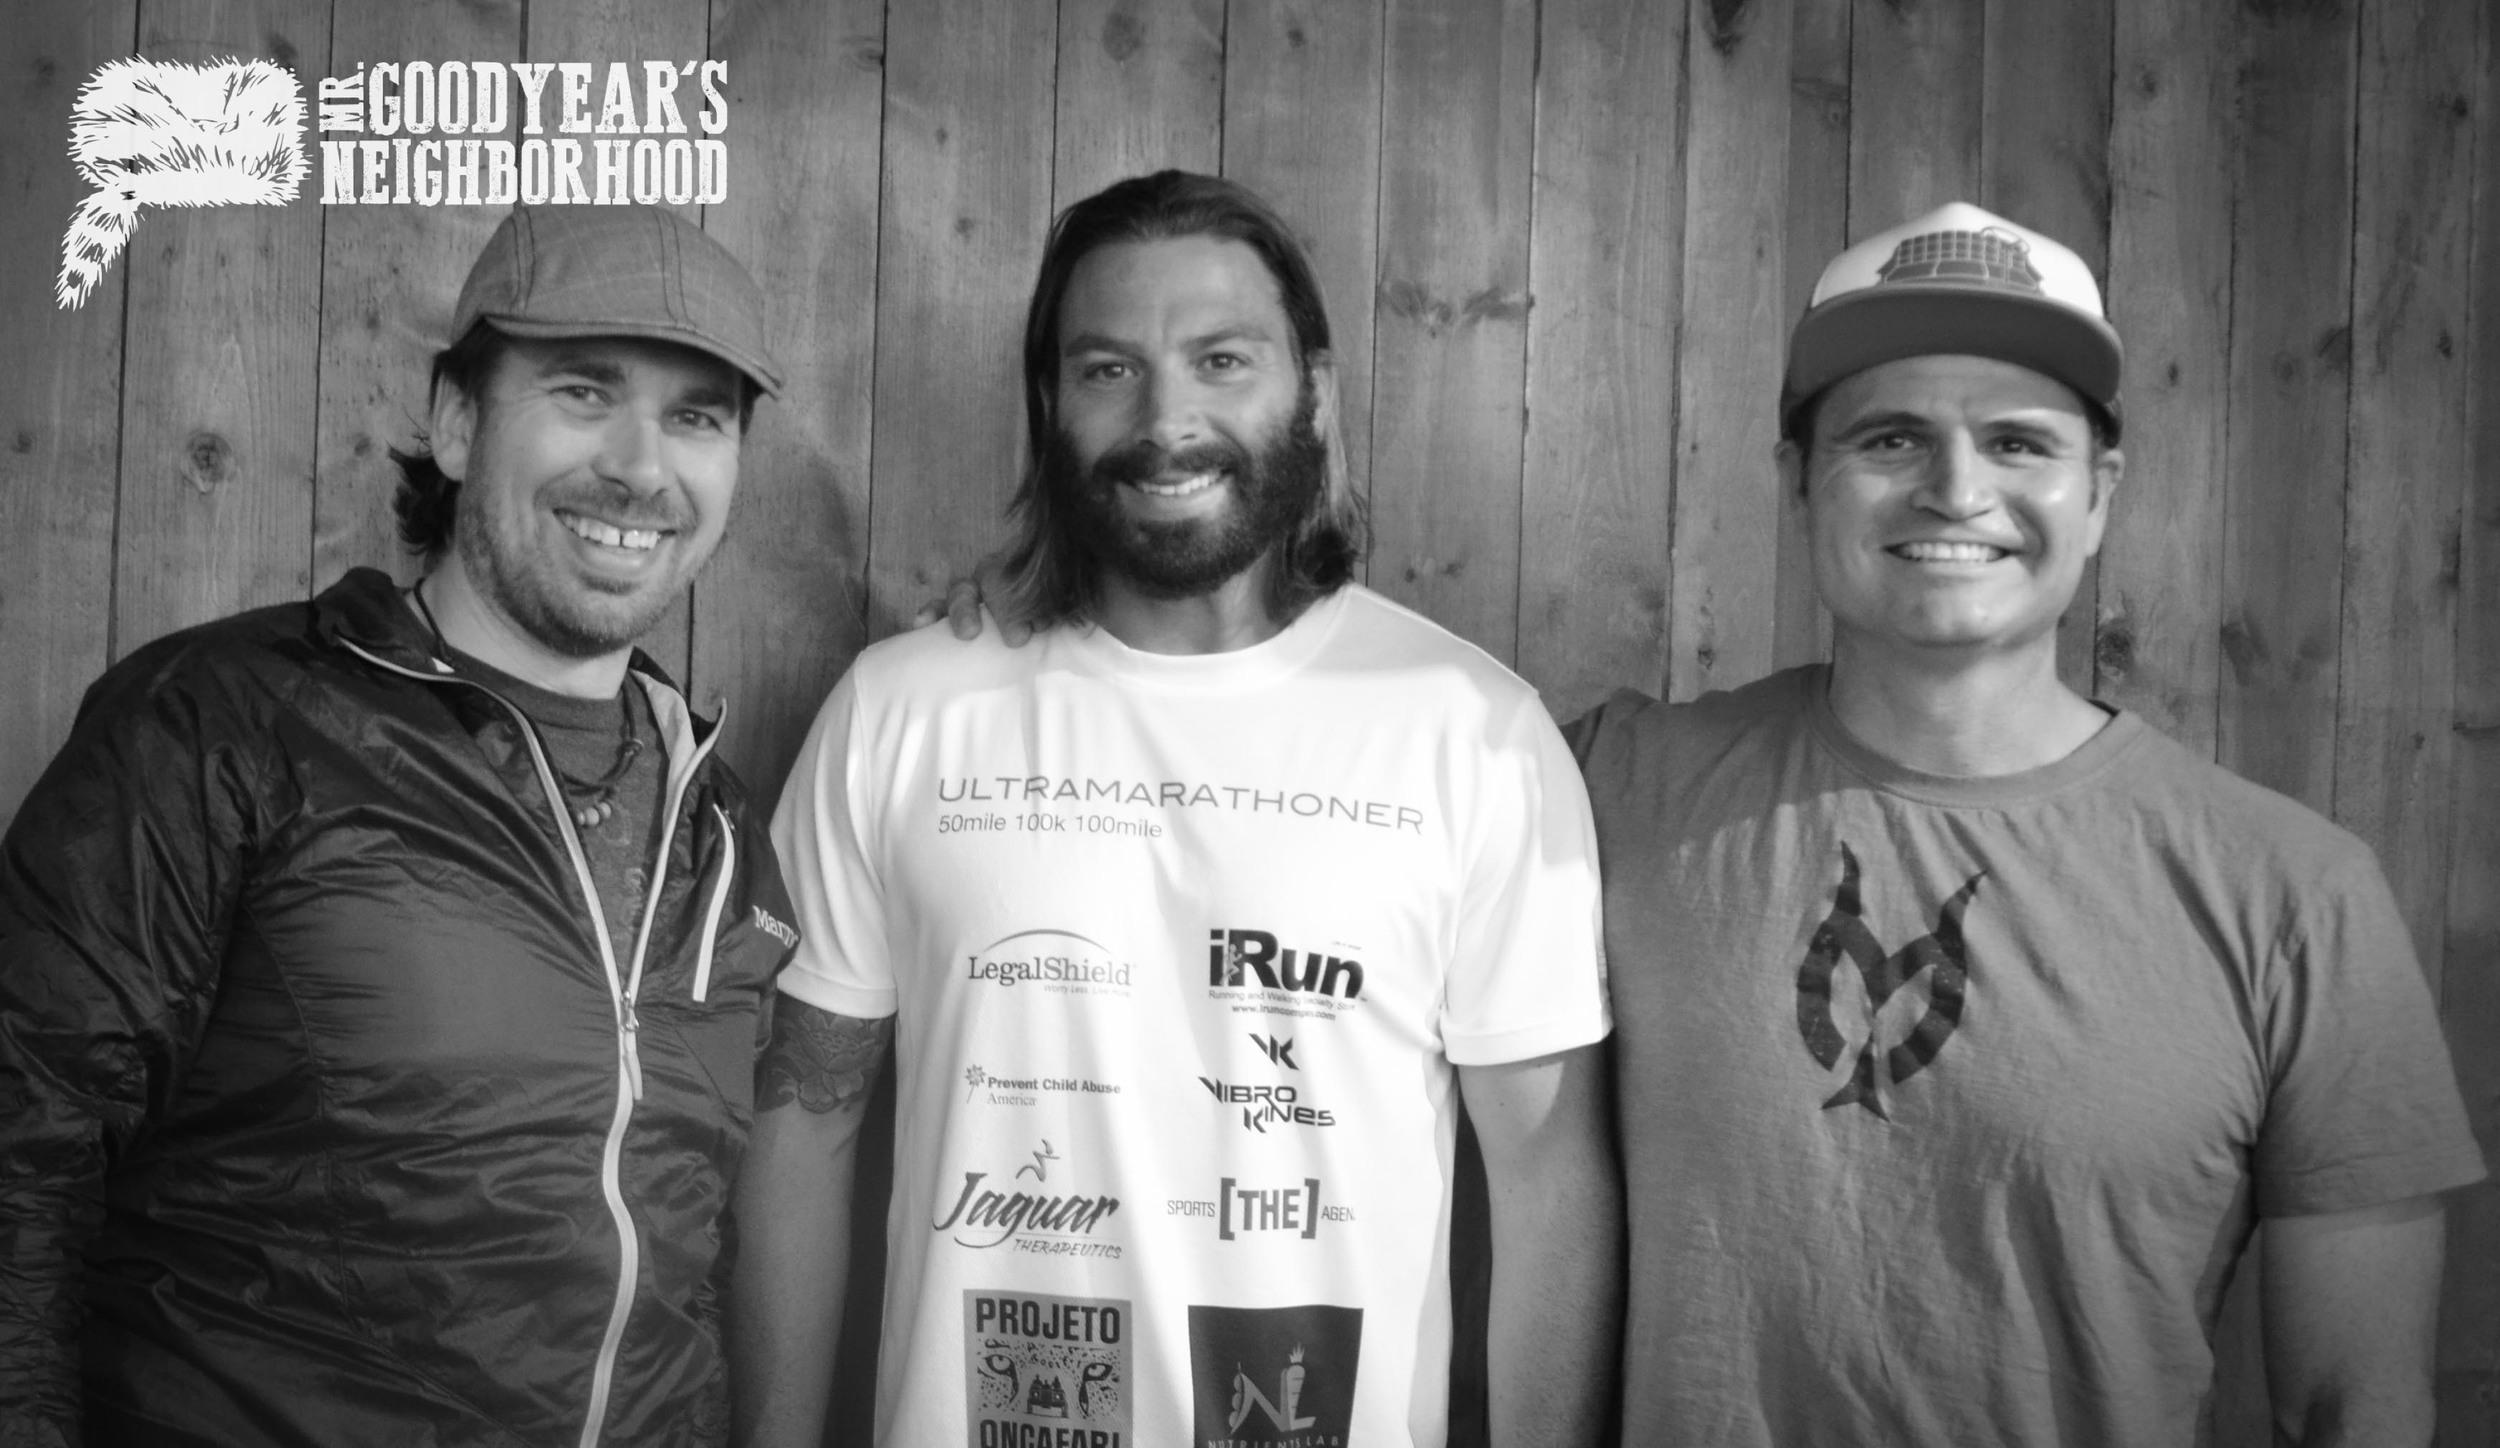 R. Brandon Long, Chad Weller, and John Wojciechowski